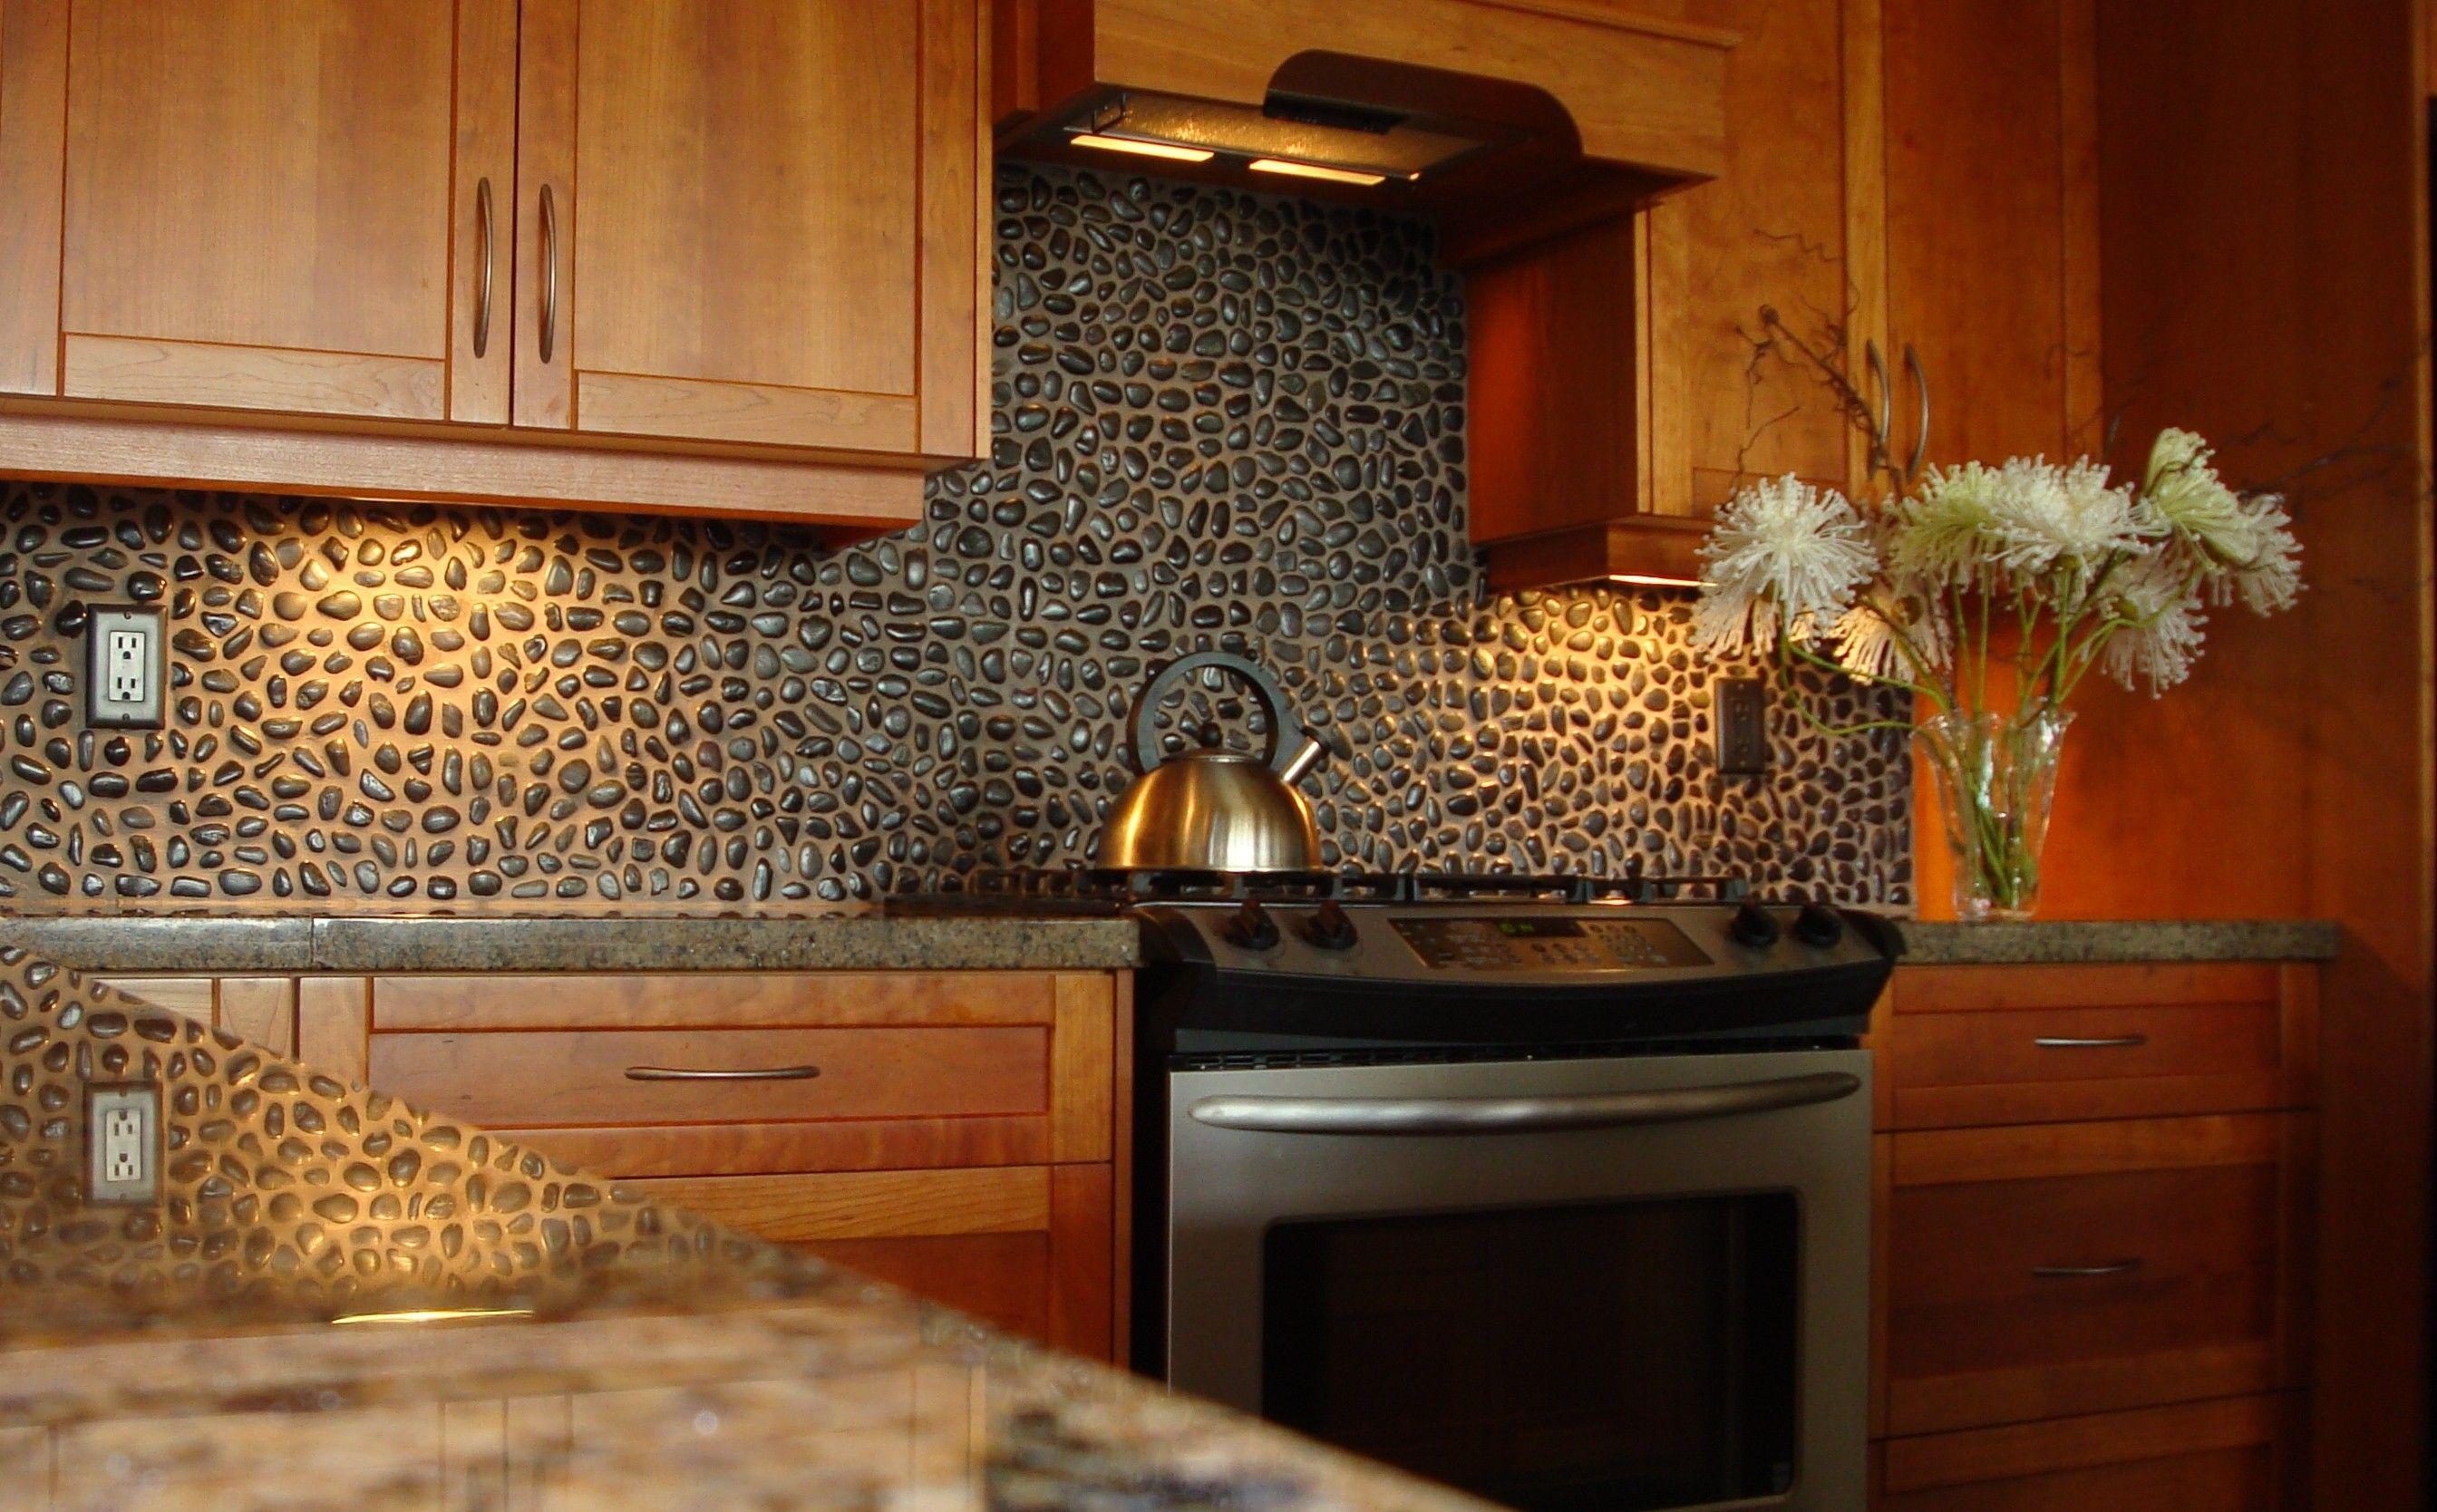 Black Stone Tile Backsplash Connected By Brown Granite ... on Black Granite Backsplash  id=17895